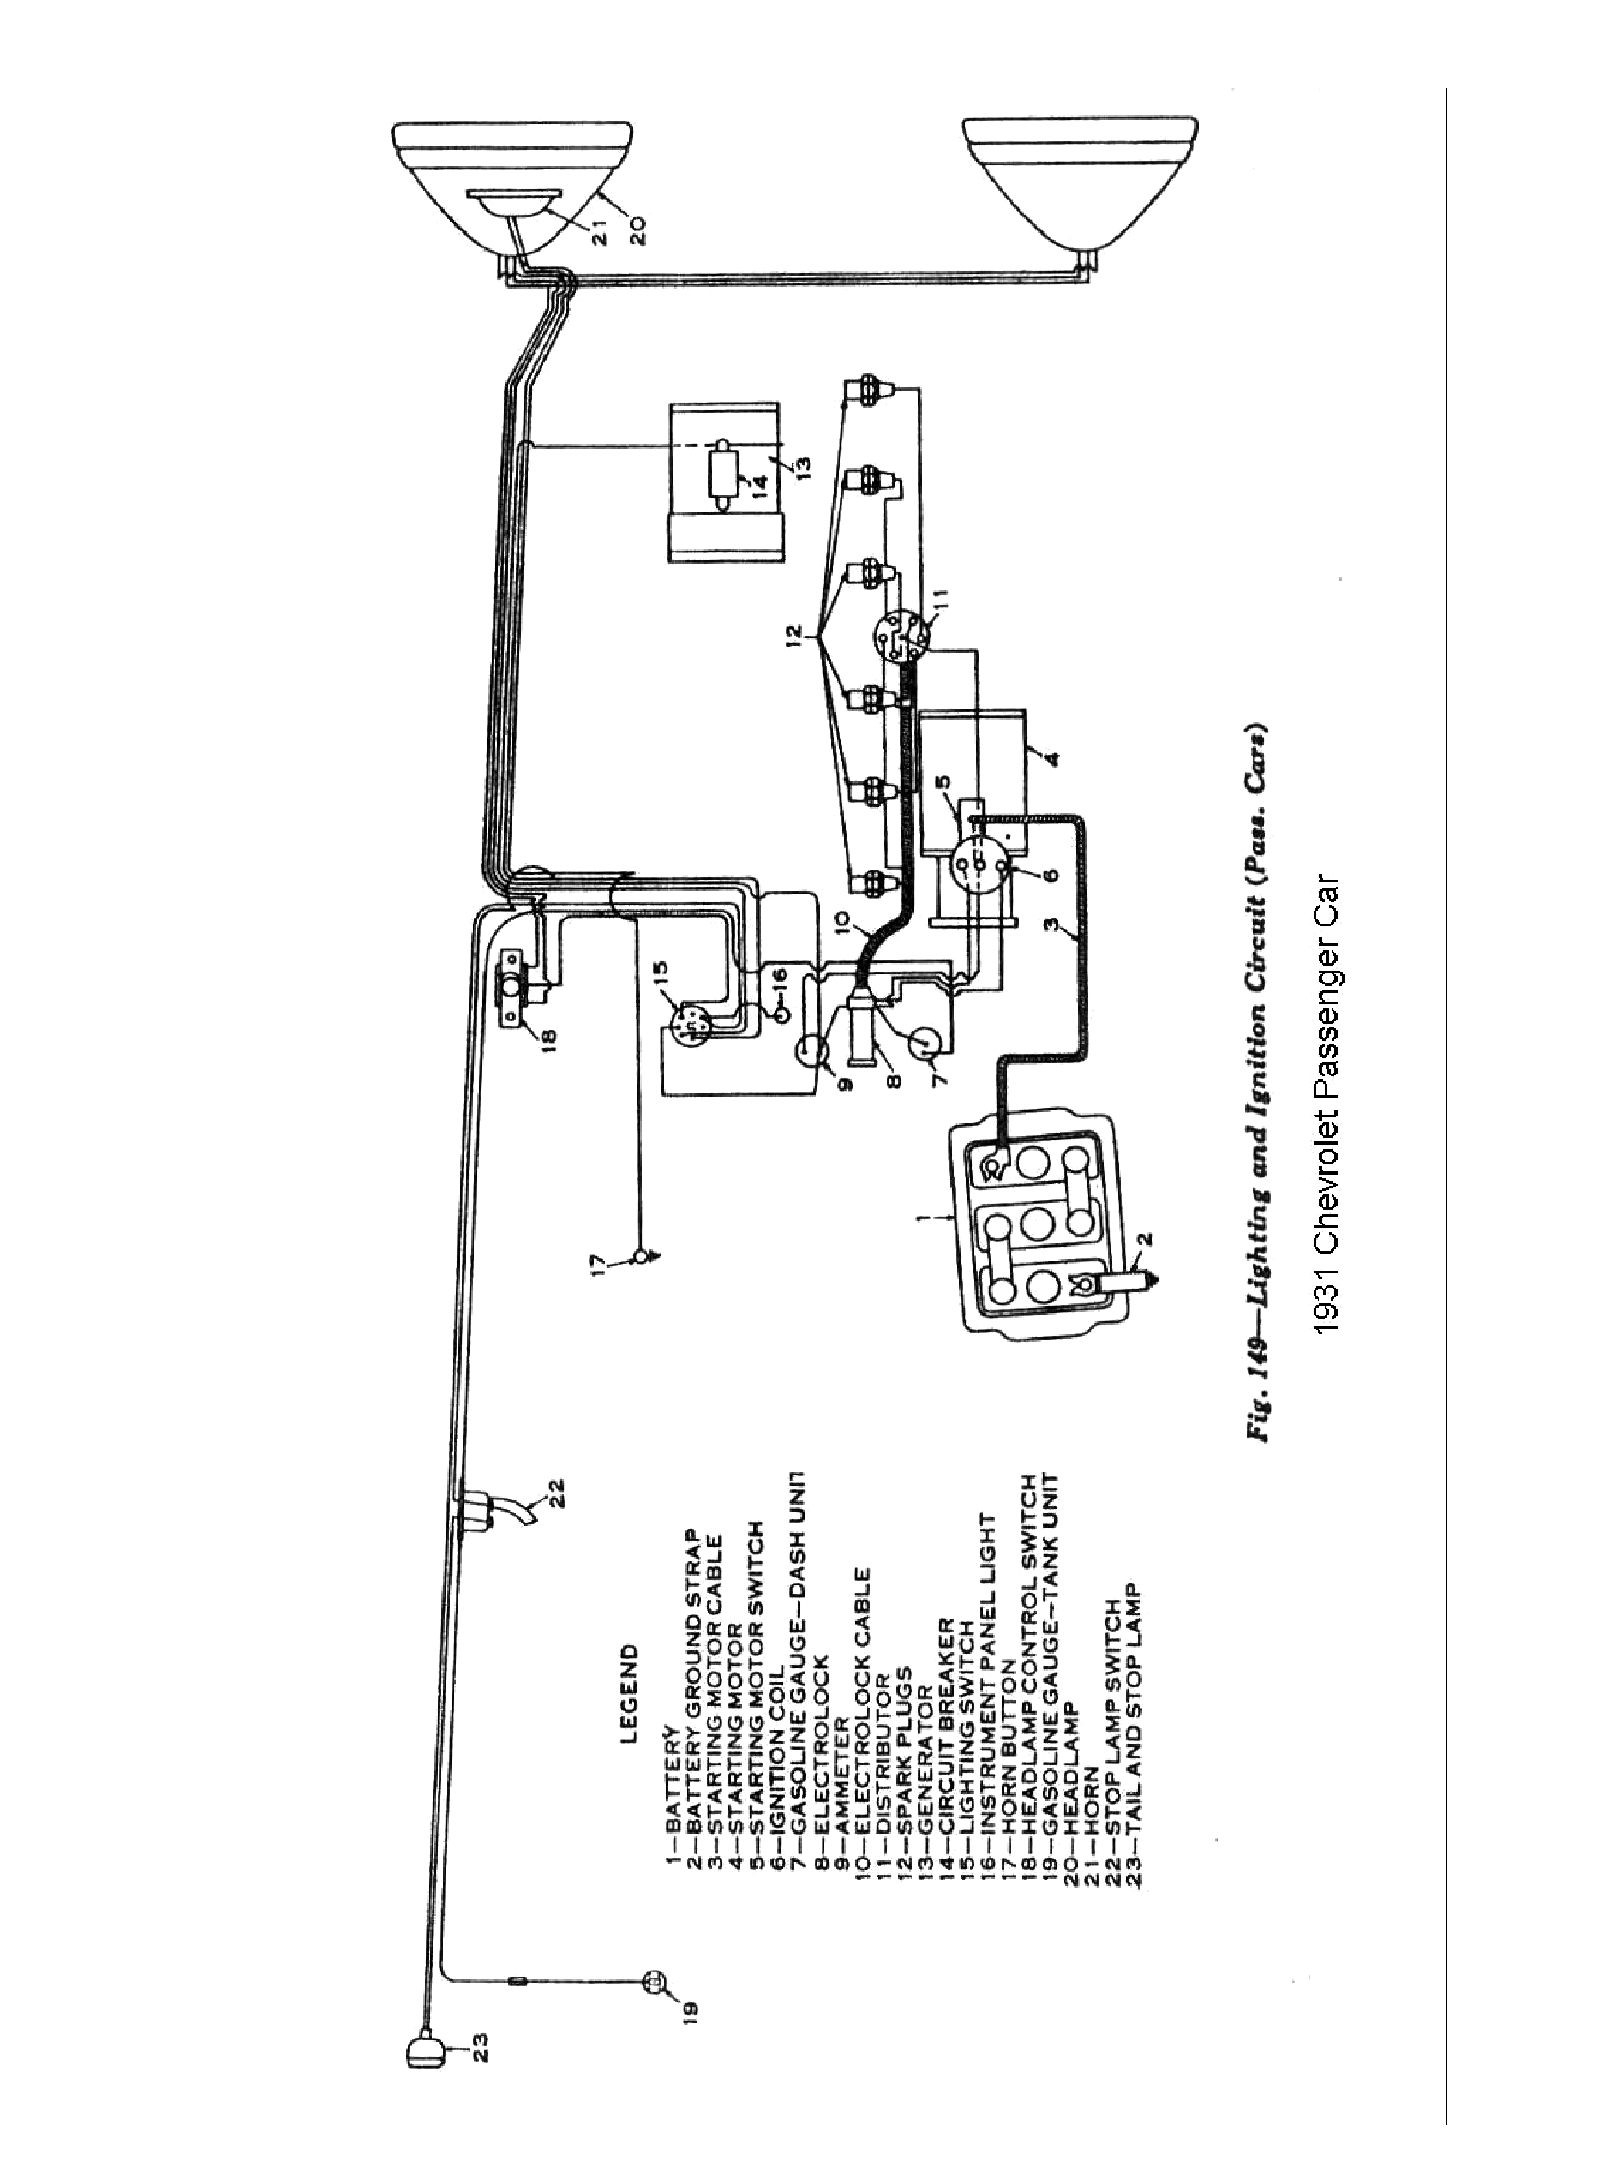 67 Camaro Fuel Tank Wiring Diagram Full Hd Version Wiring Diagram Taubdiagram Radd Fr